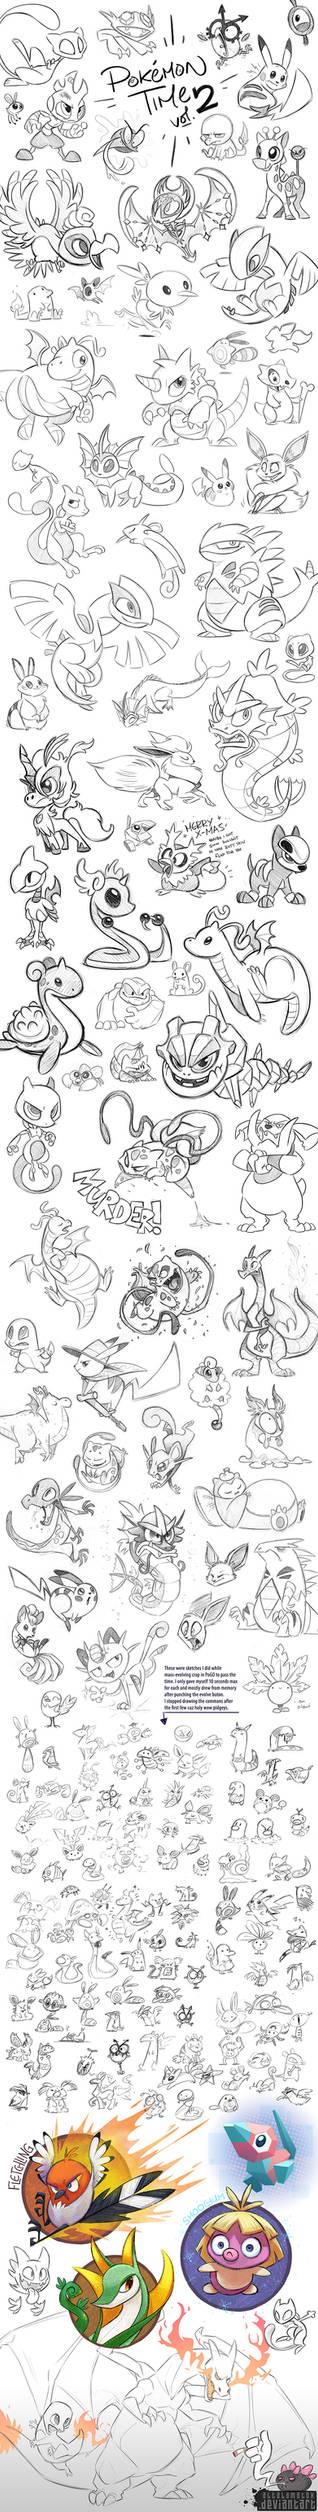 Pokemon Time 2